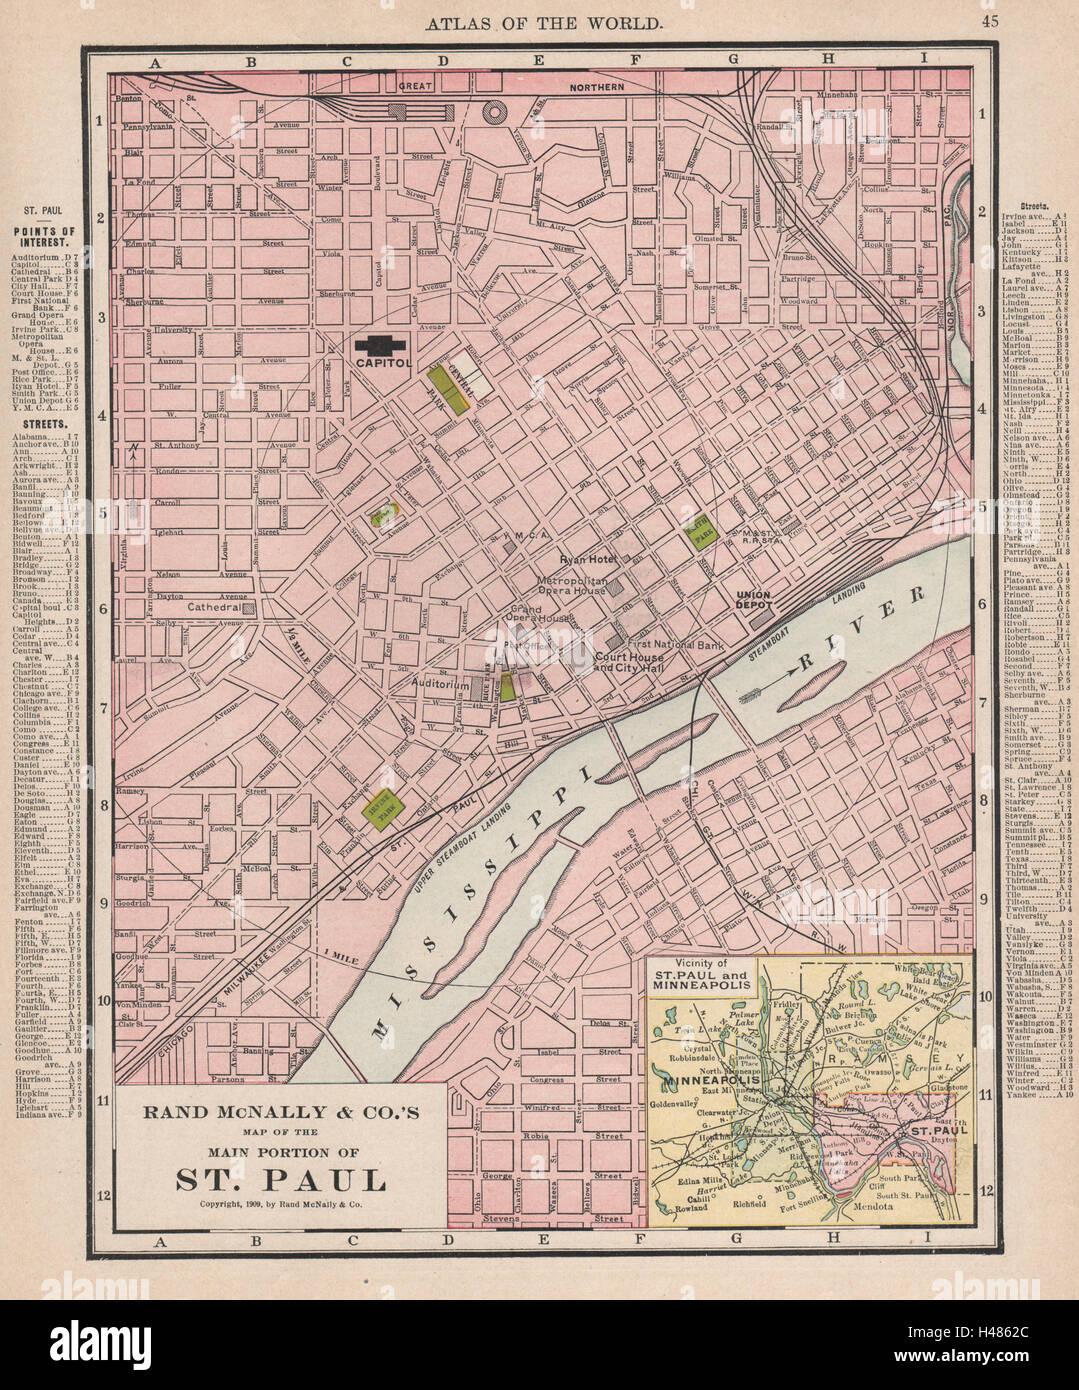 St Paul Town City Map Plan Minneapolis Minnesota RAND MCNALLY - Minnesota city map